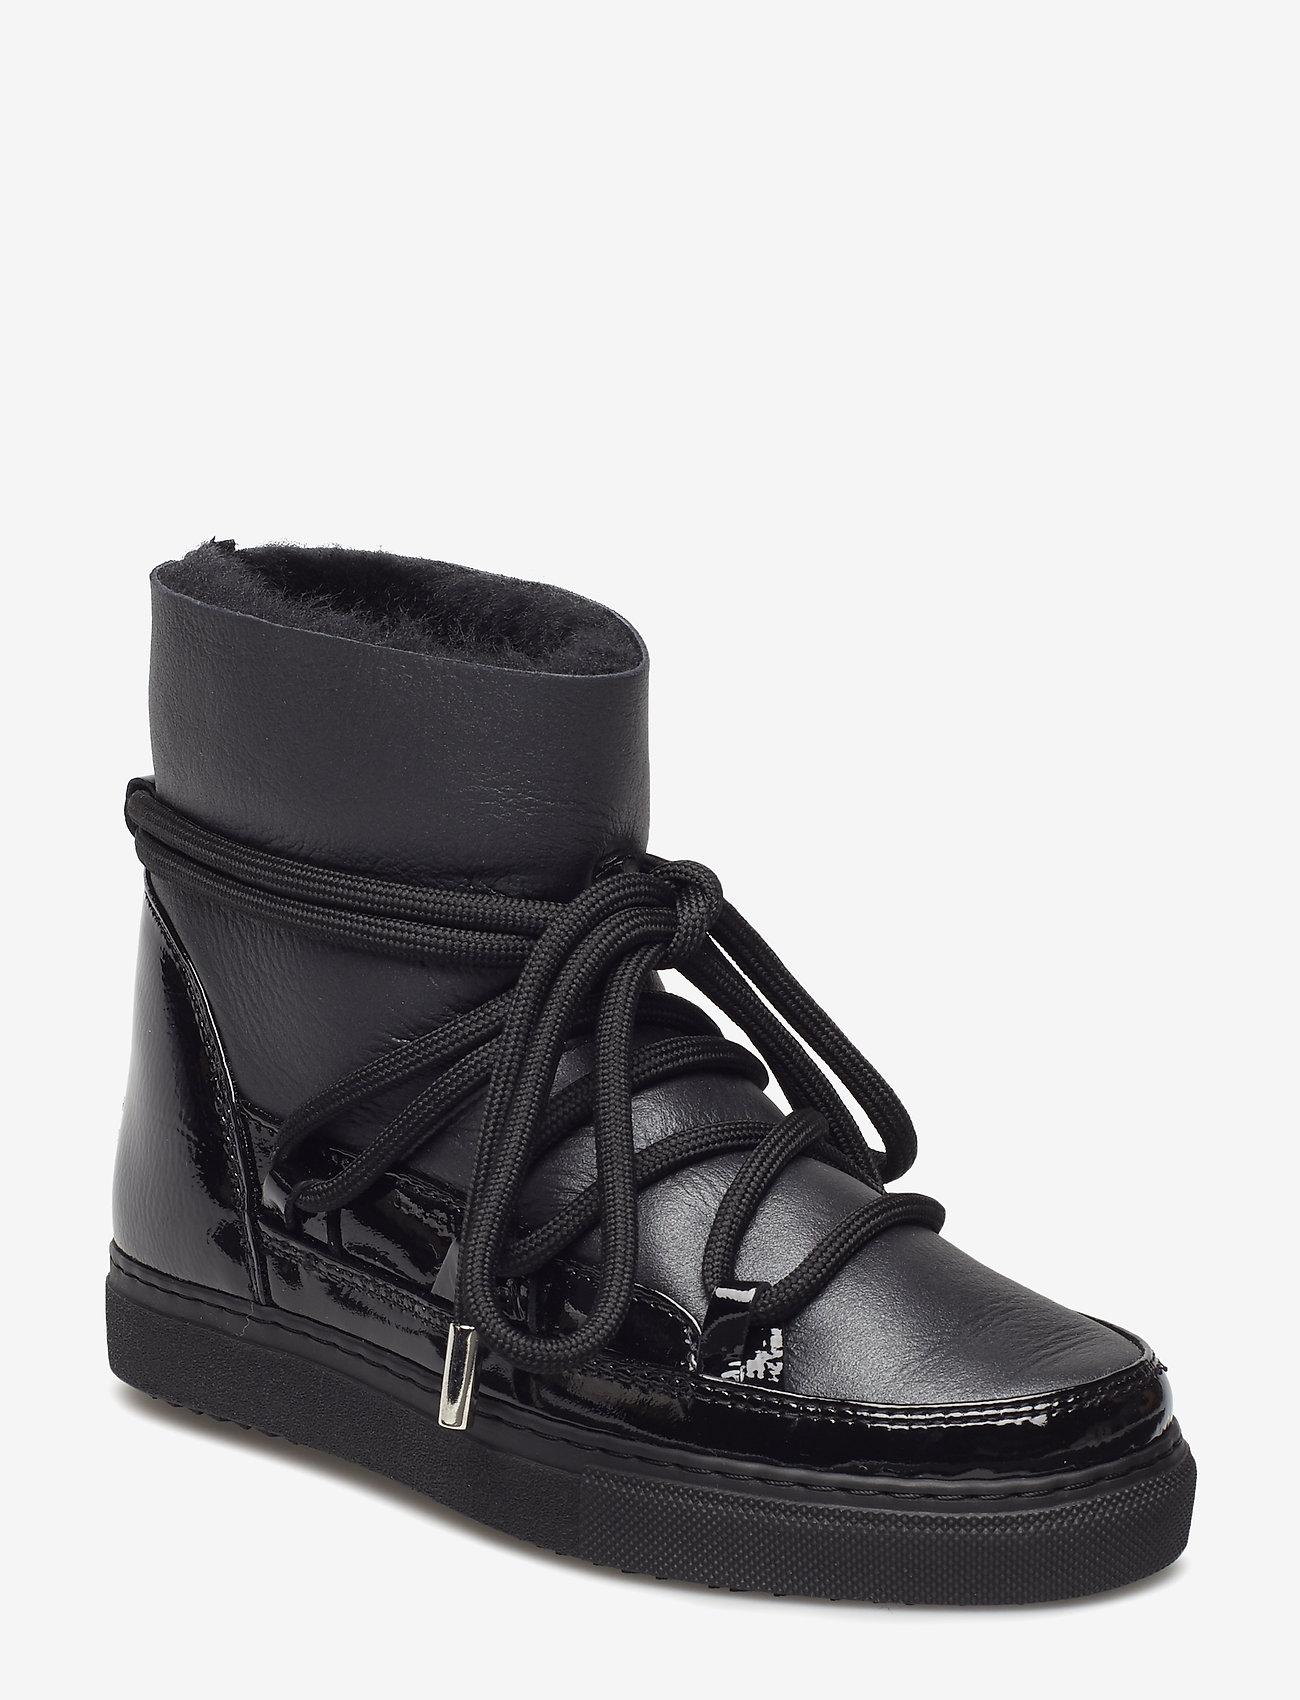 Inuikii Sneaker Gloss (Black) (188.30